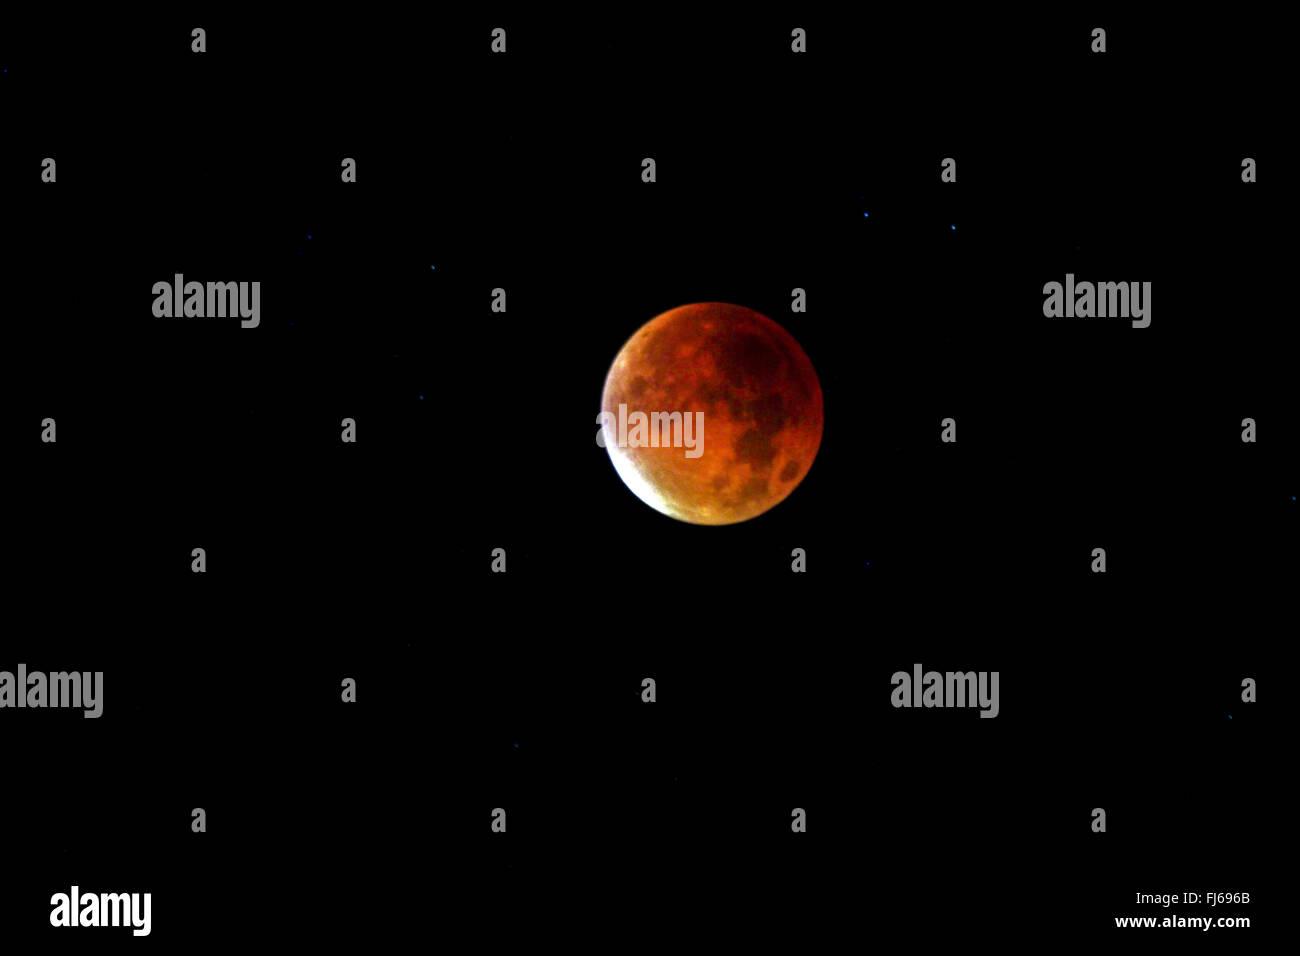 lunar eclipse, blood moon, 28.09.2015, Germany, North Rhine-Westphalia, Ruhr Area, Essen - Stock Image